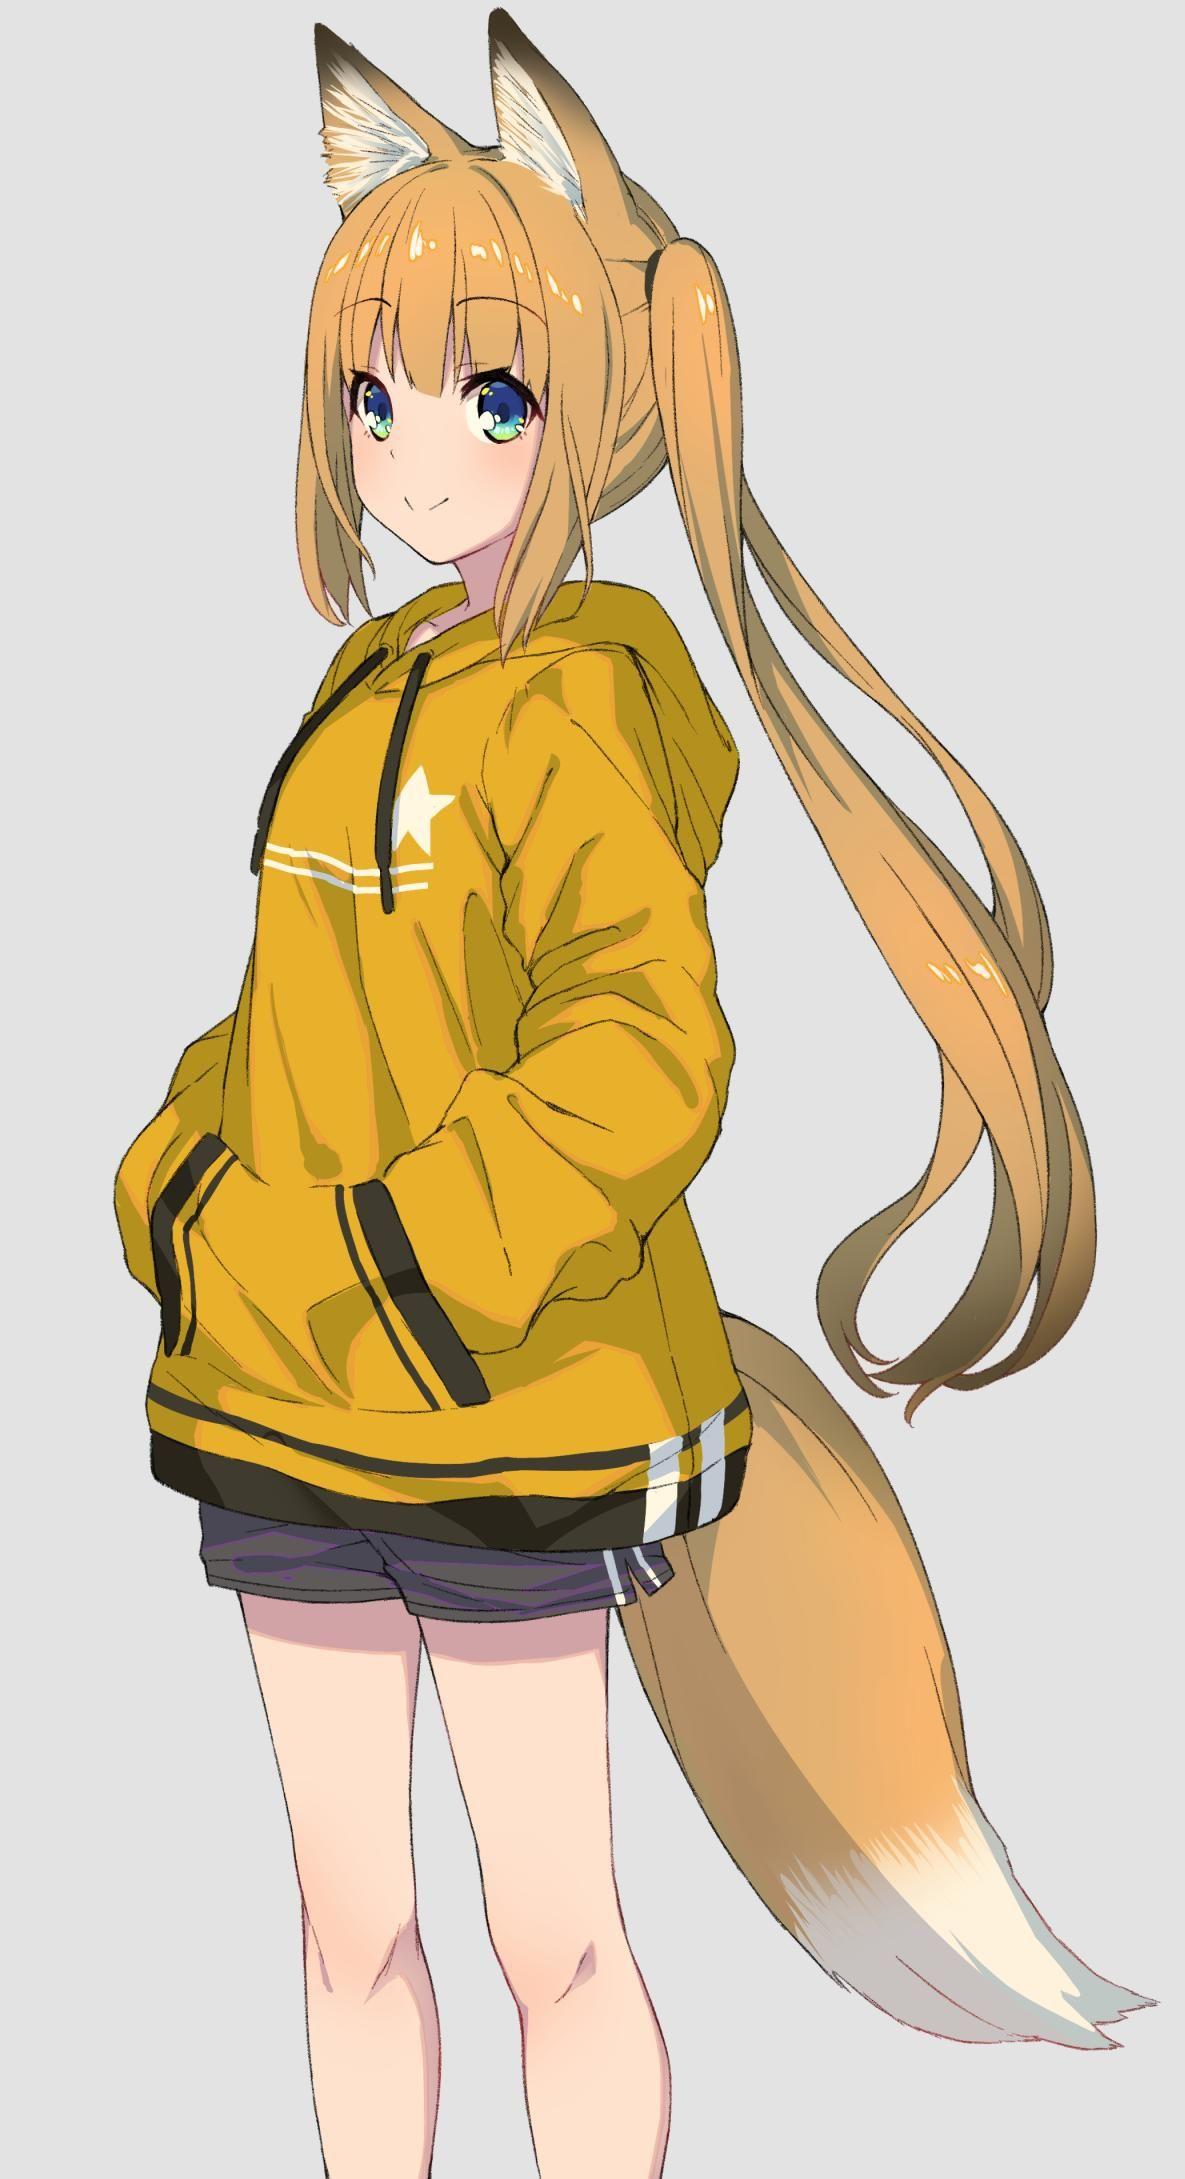 Hoodie fox girl [Original]  Fox girl, Cute fox drawing, Neko girl